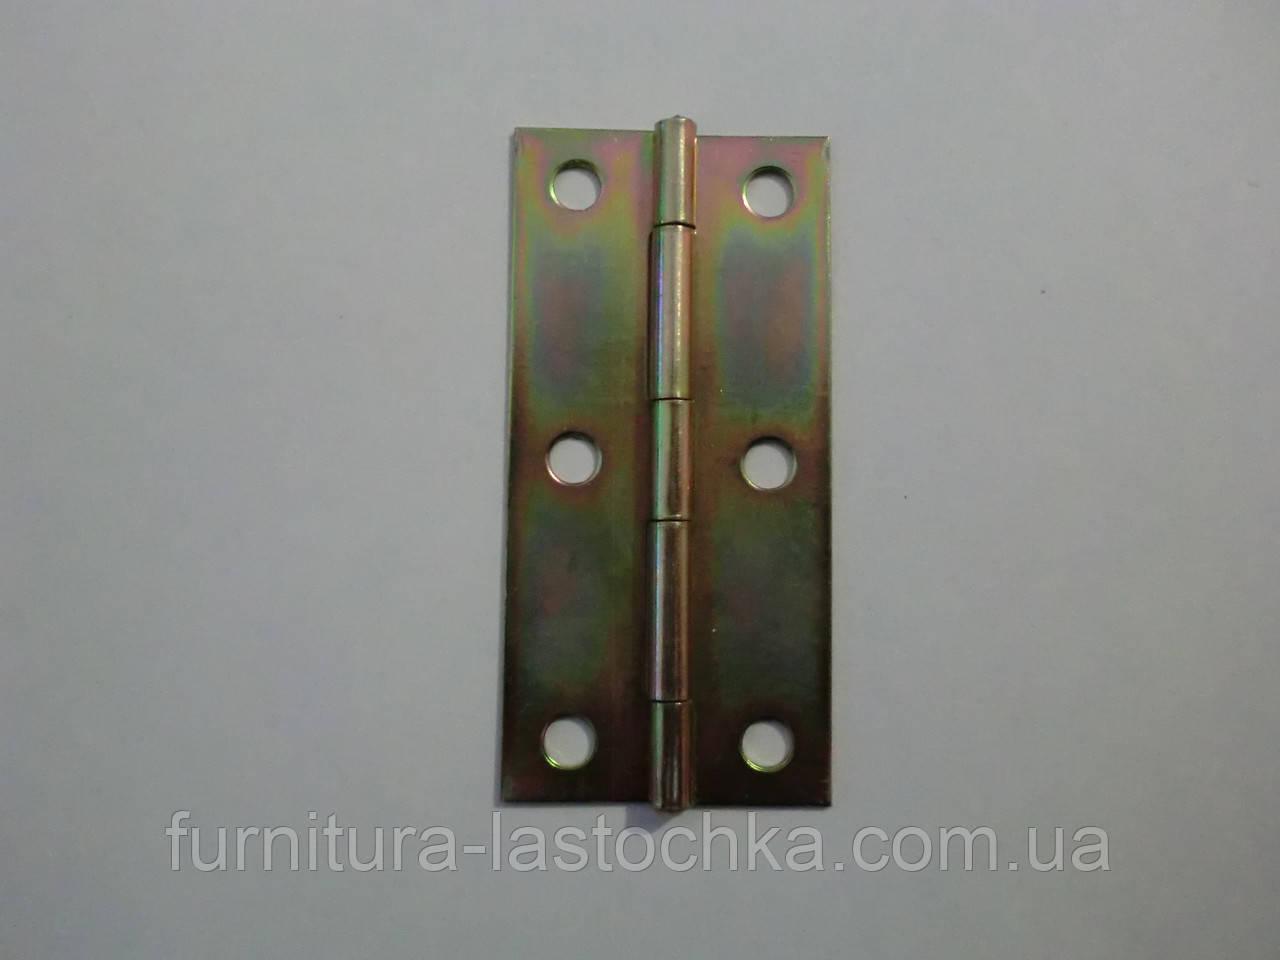 Петля форточная 70 мм, оцинкованная, узкая